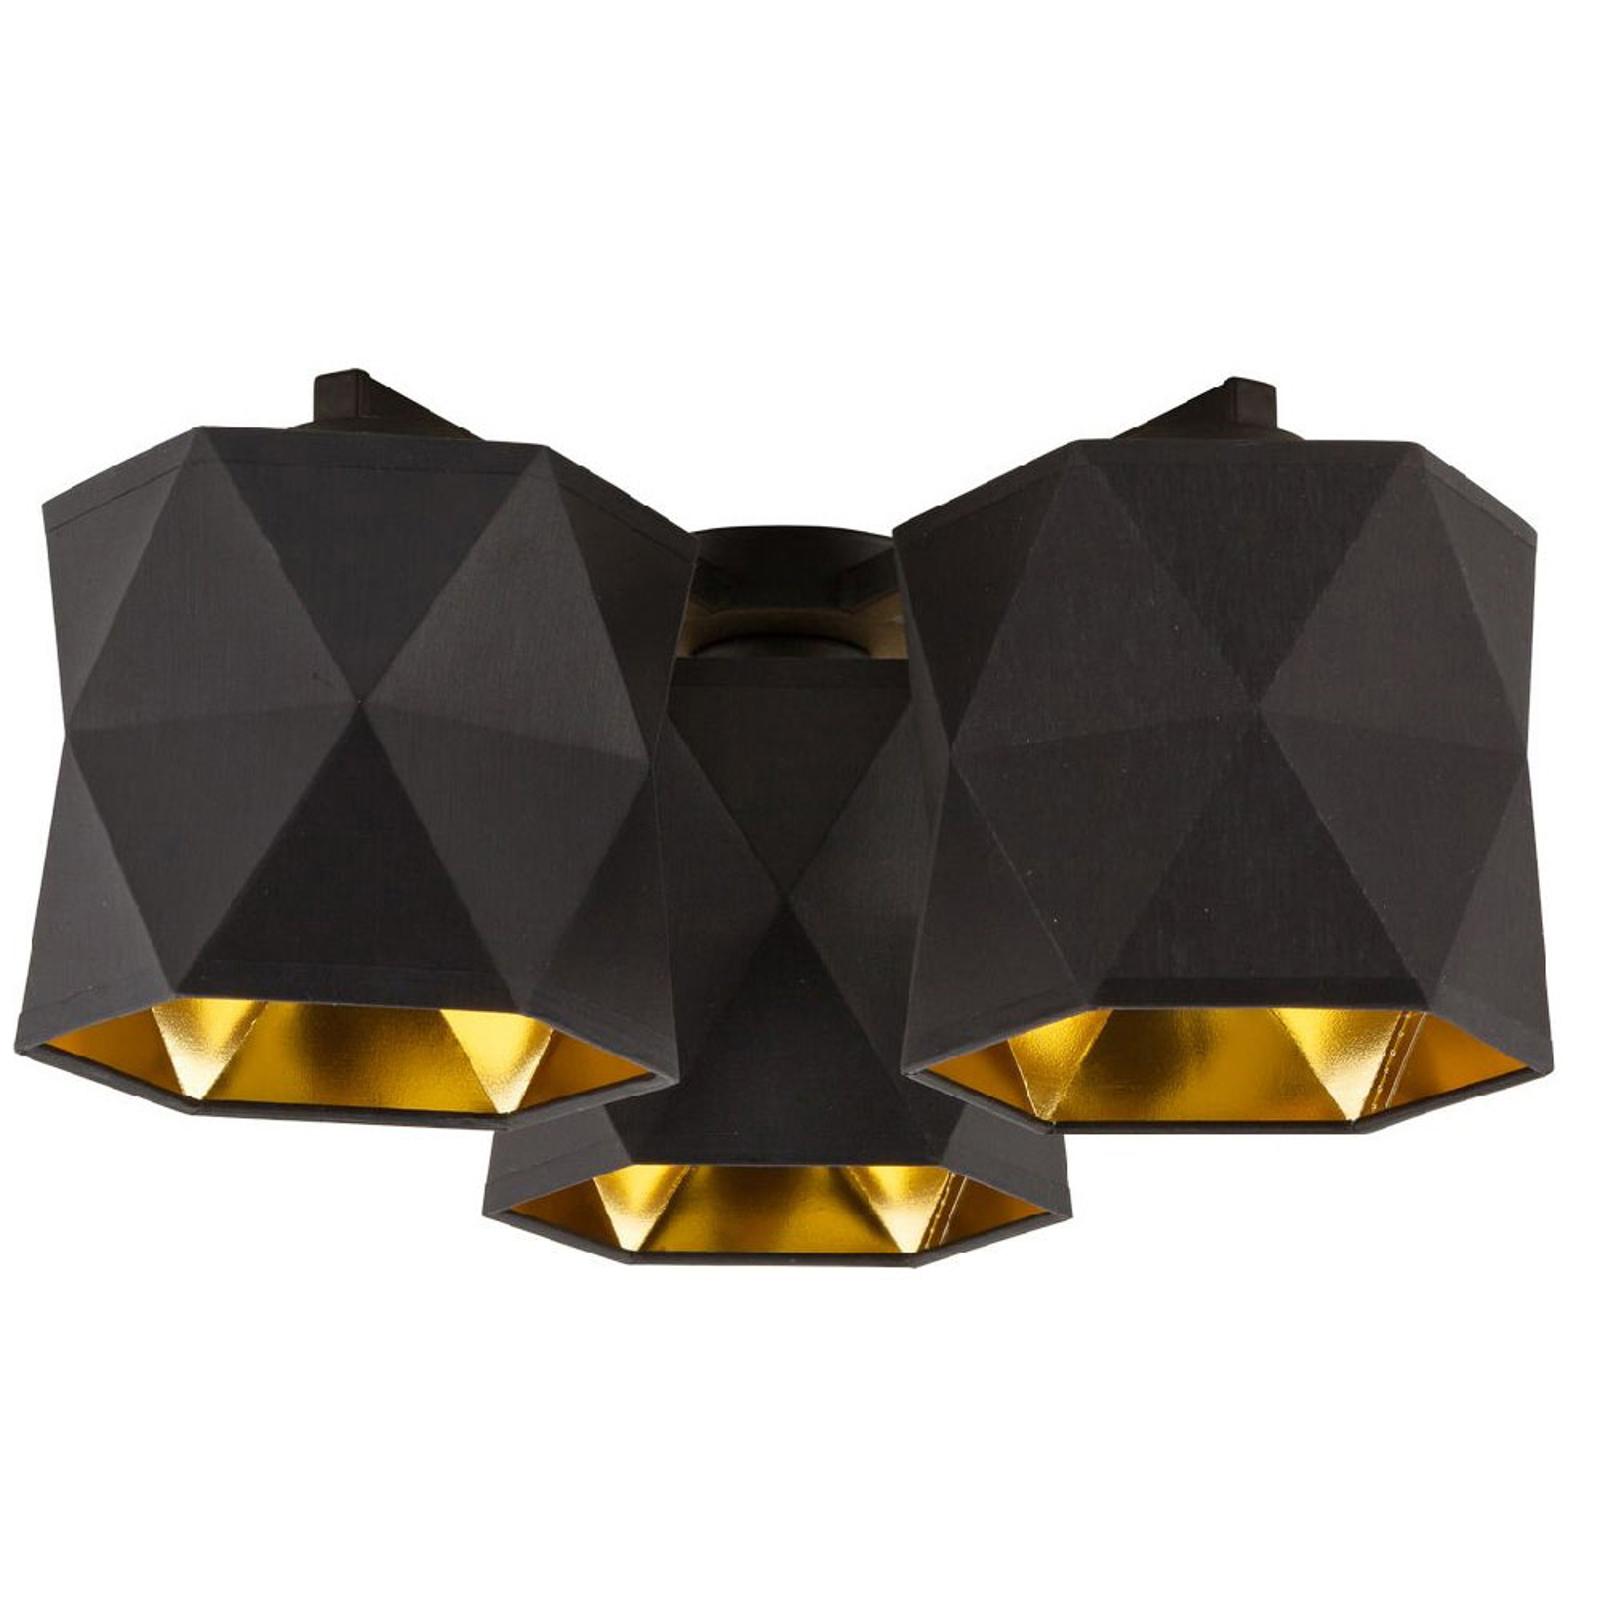 Siro taklampe, 3 lyskilder Ø 39 cm